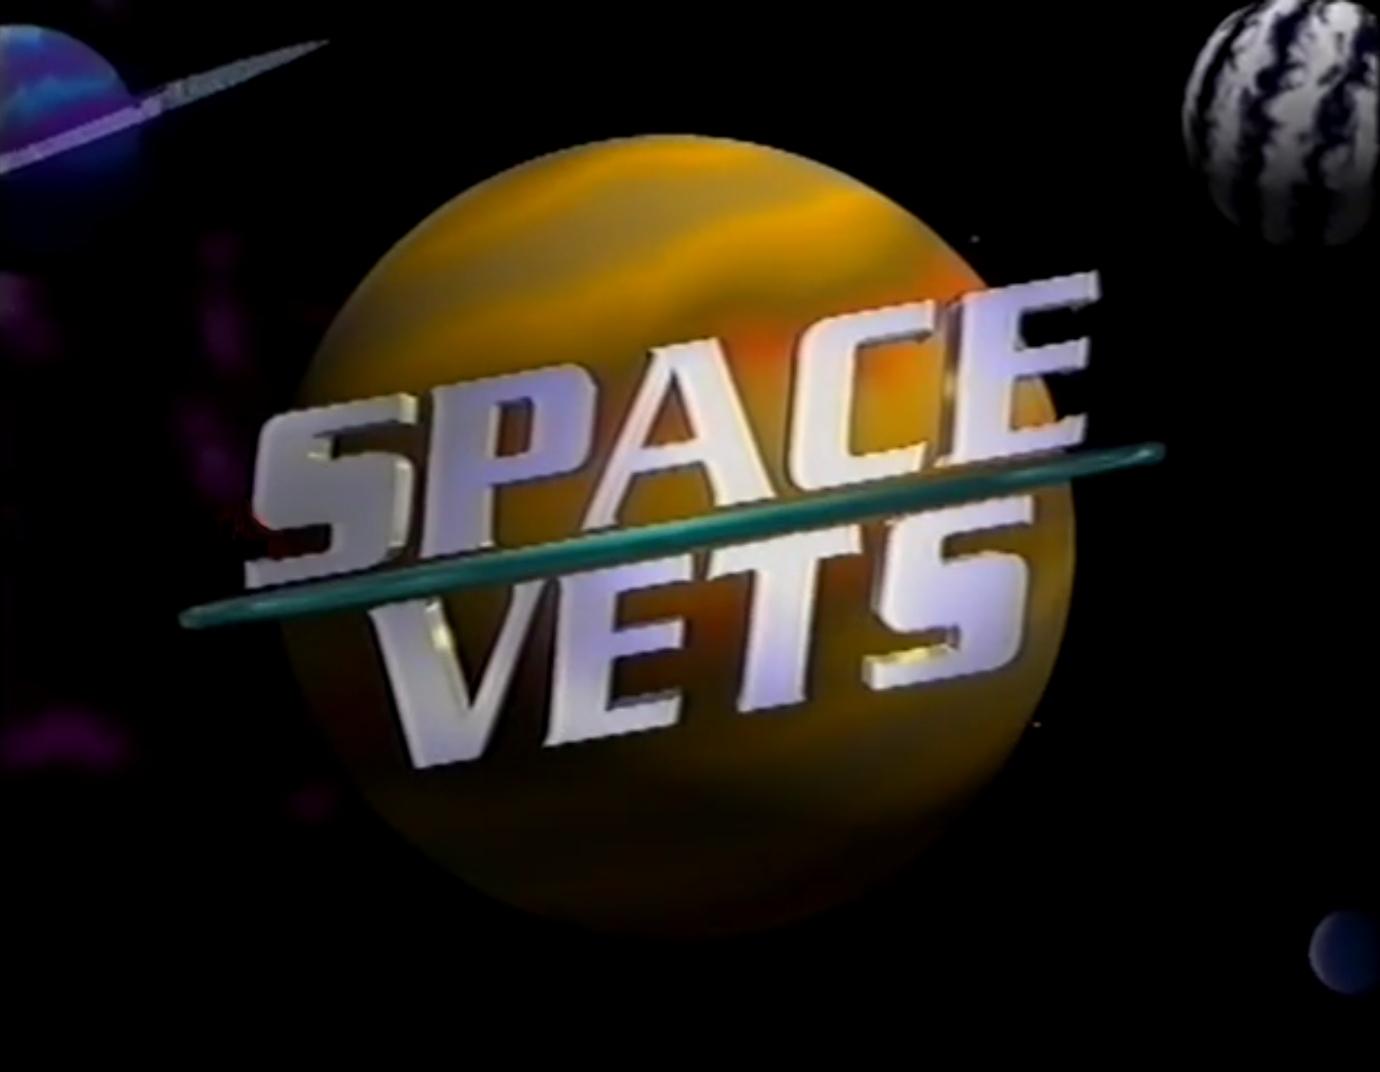 SpaceVets